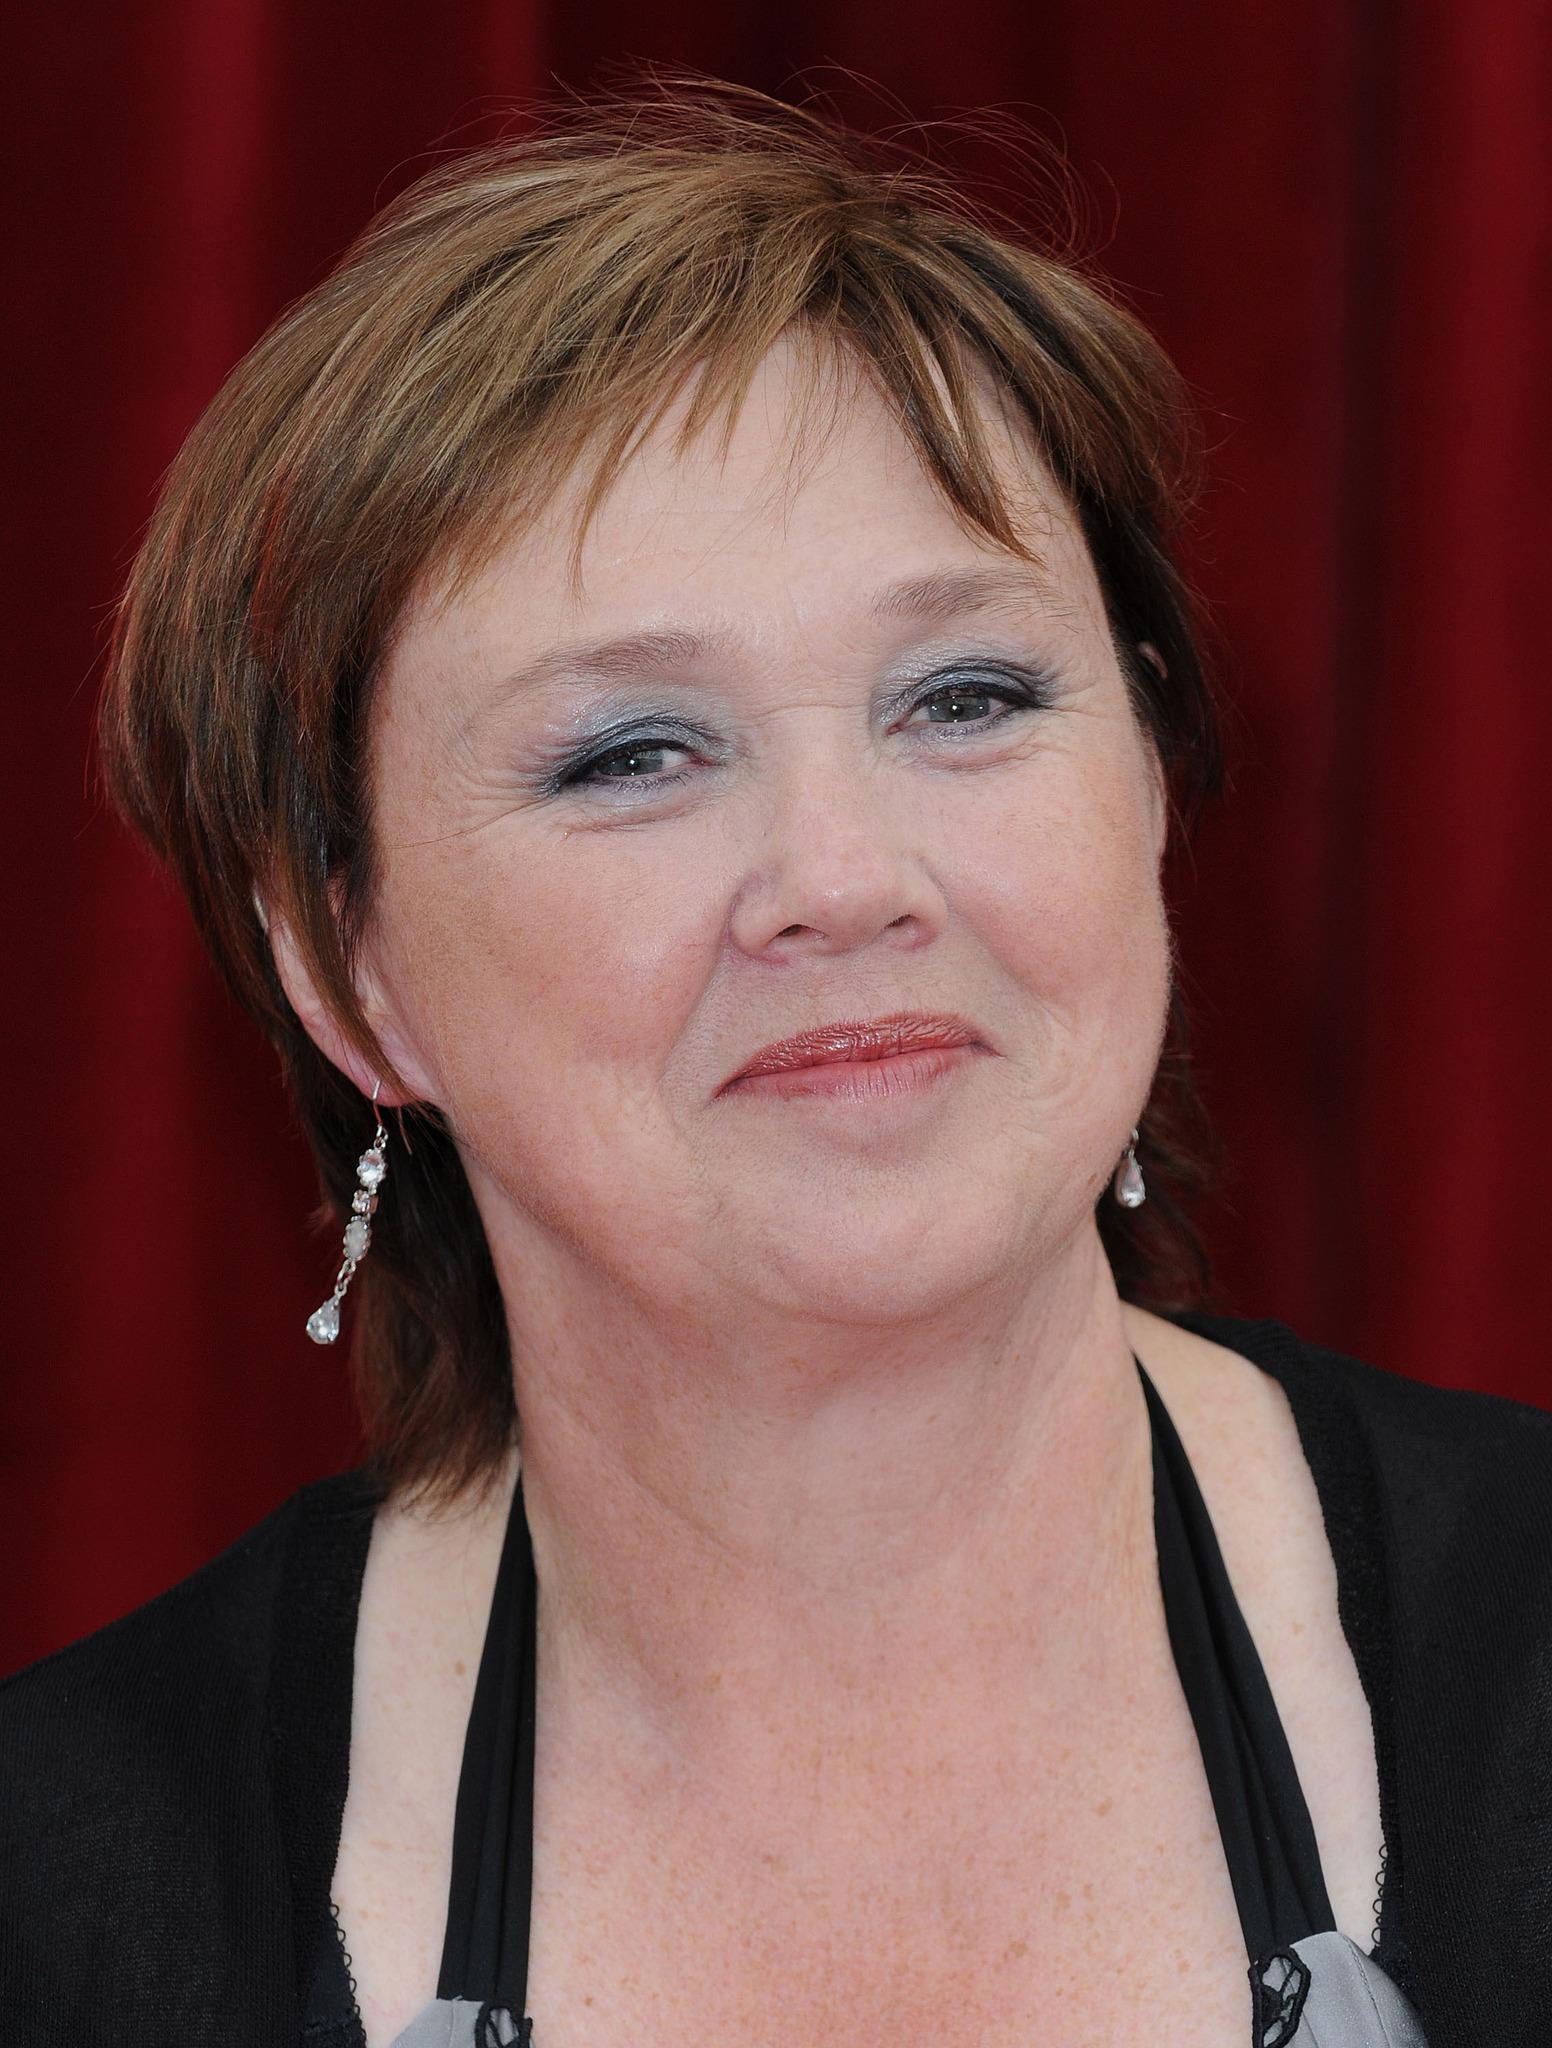 Pauline Quirke - IMDb